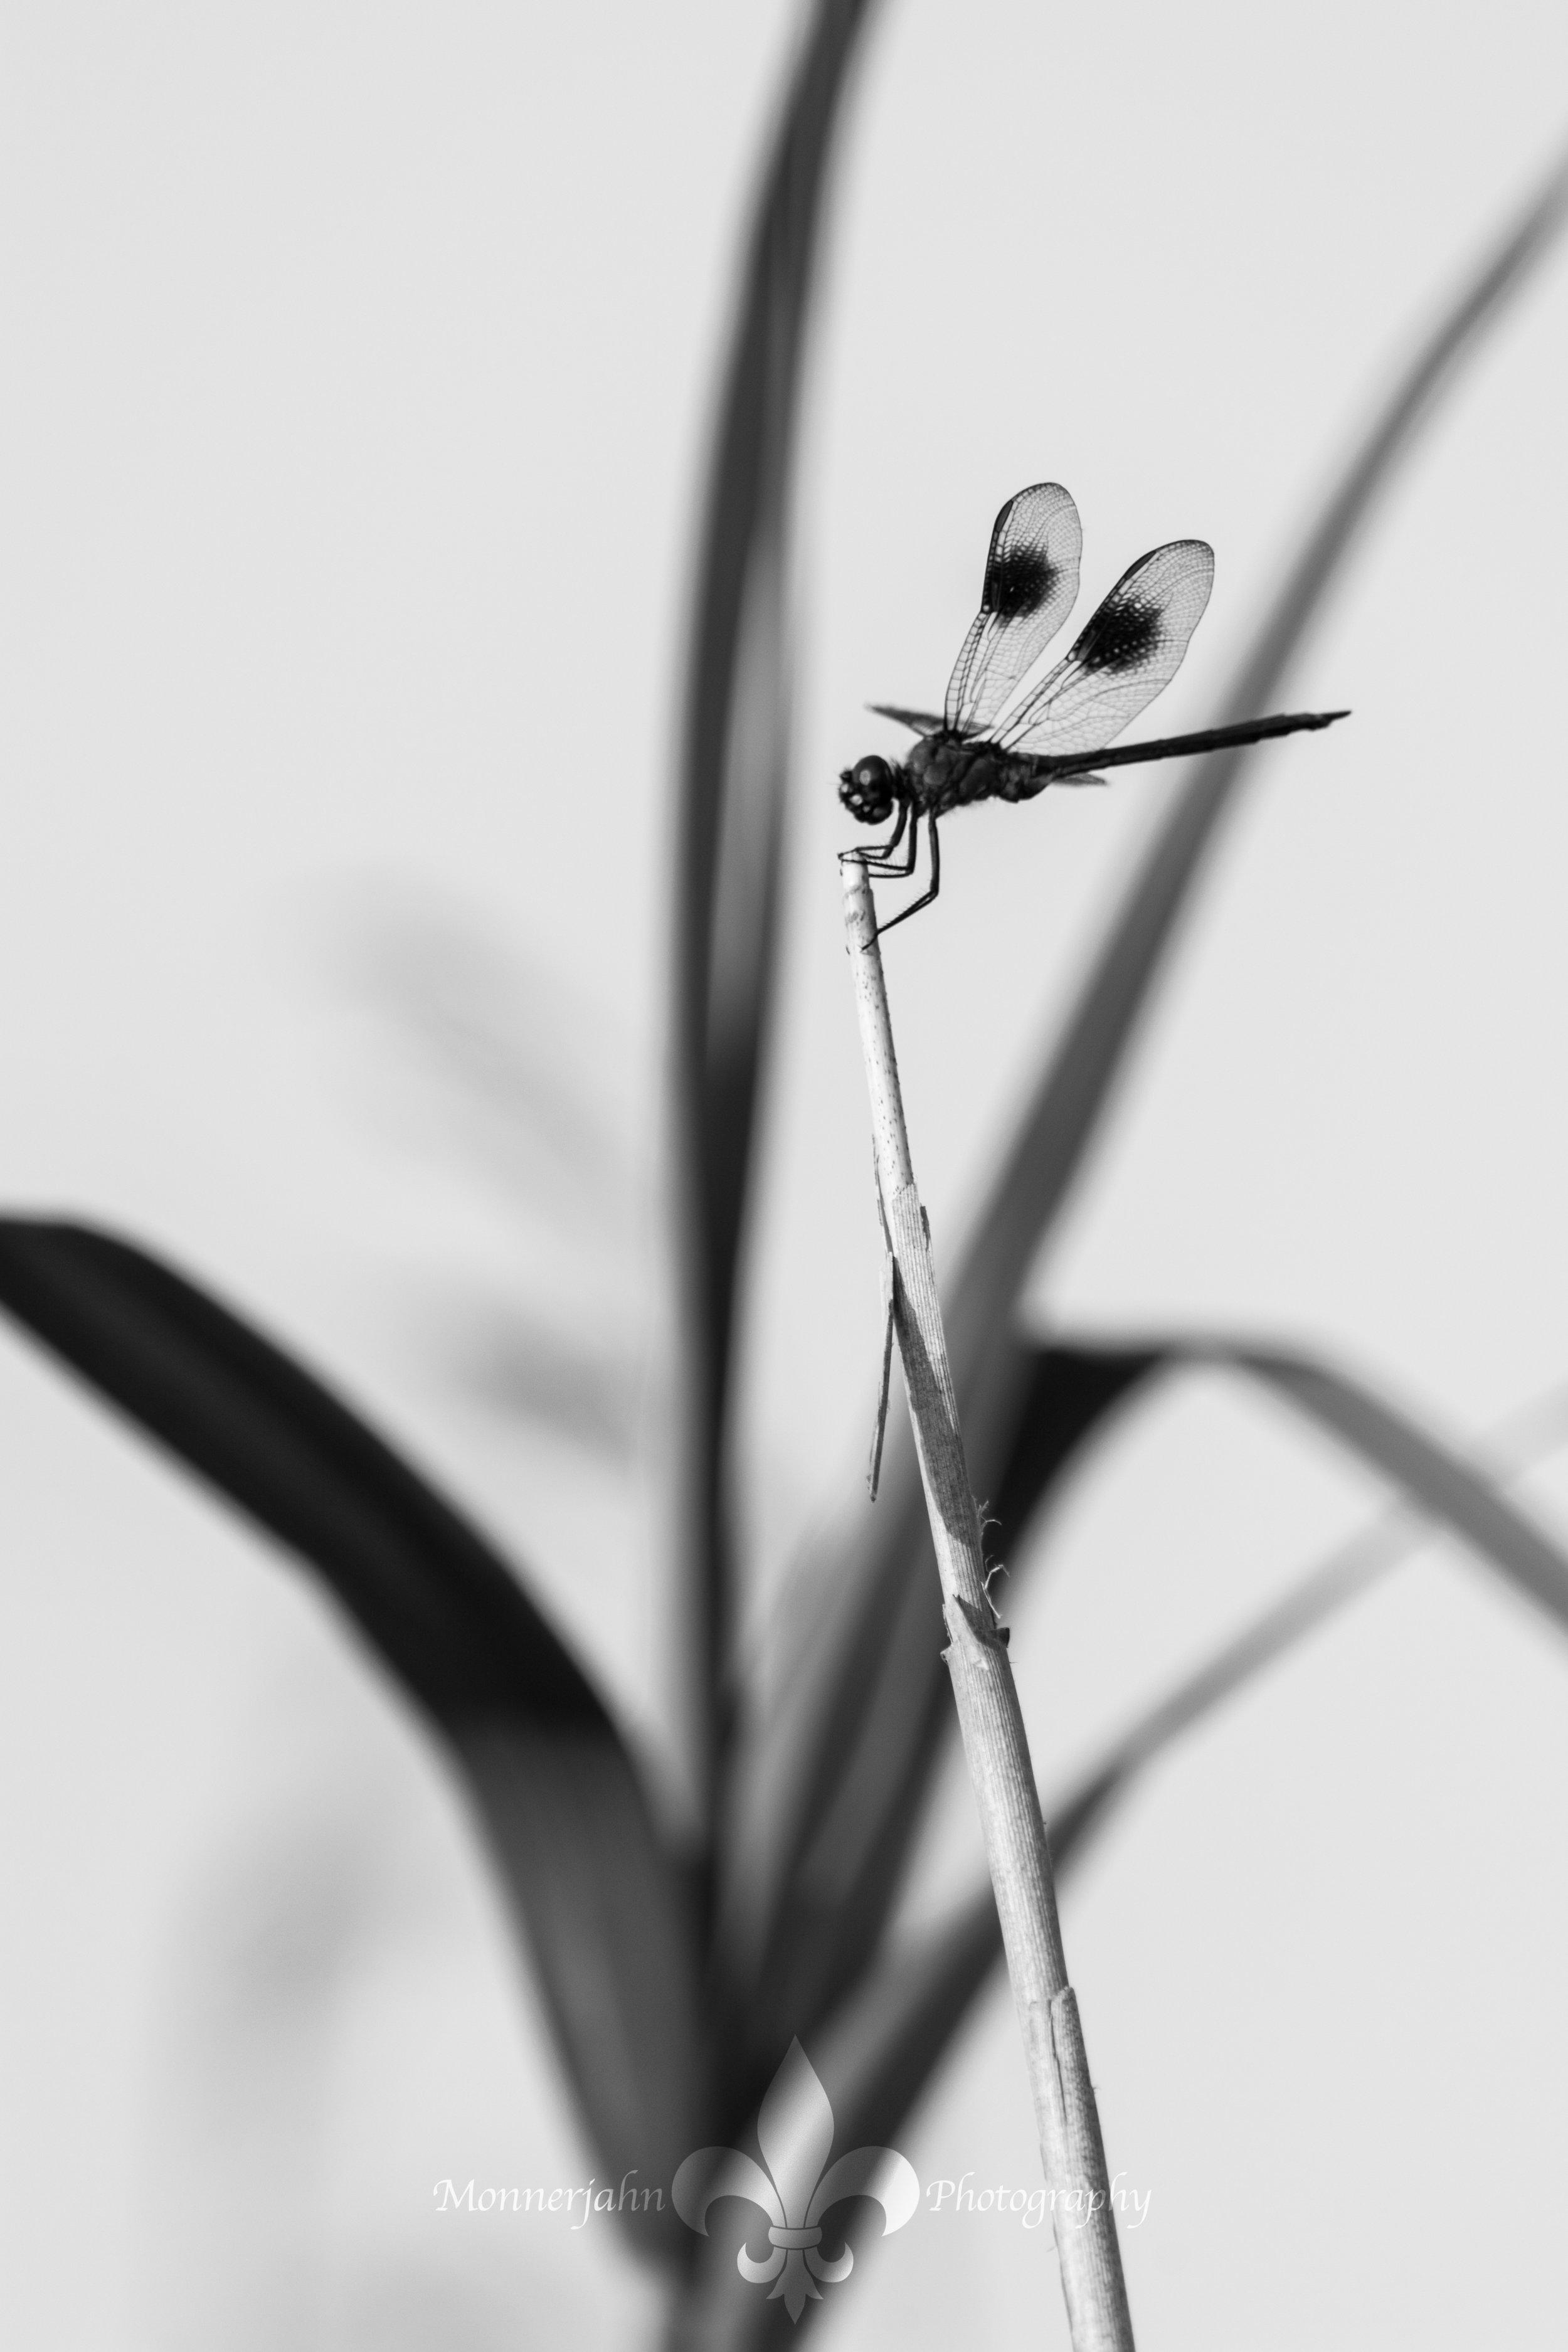 Dragonfly-116.jpg